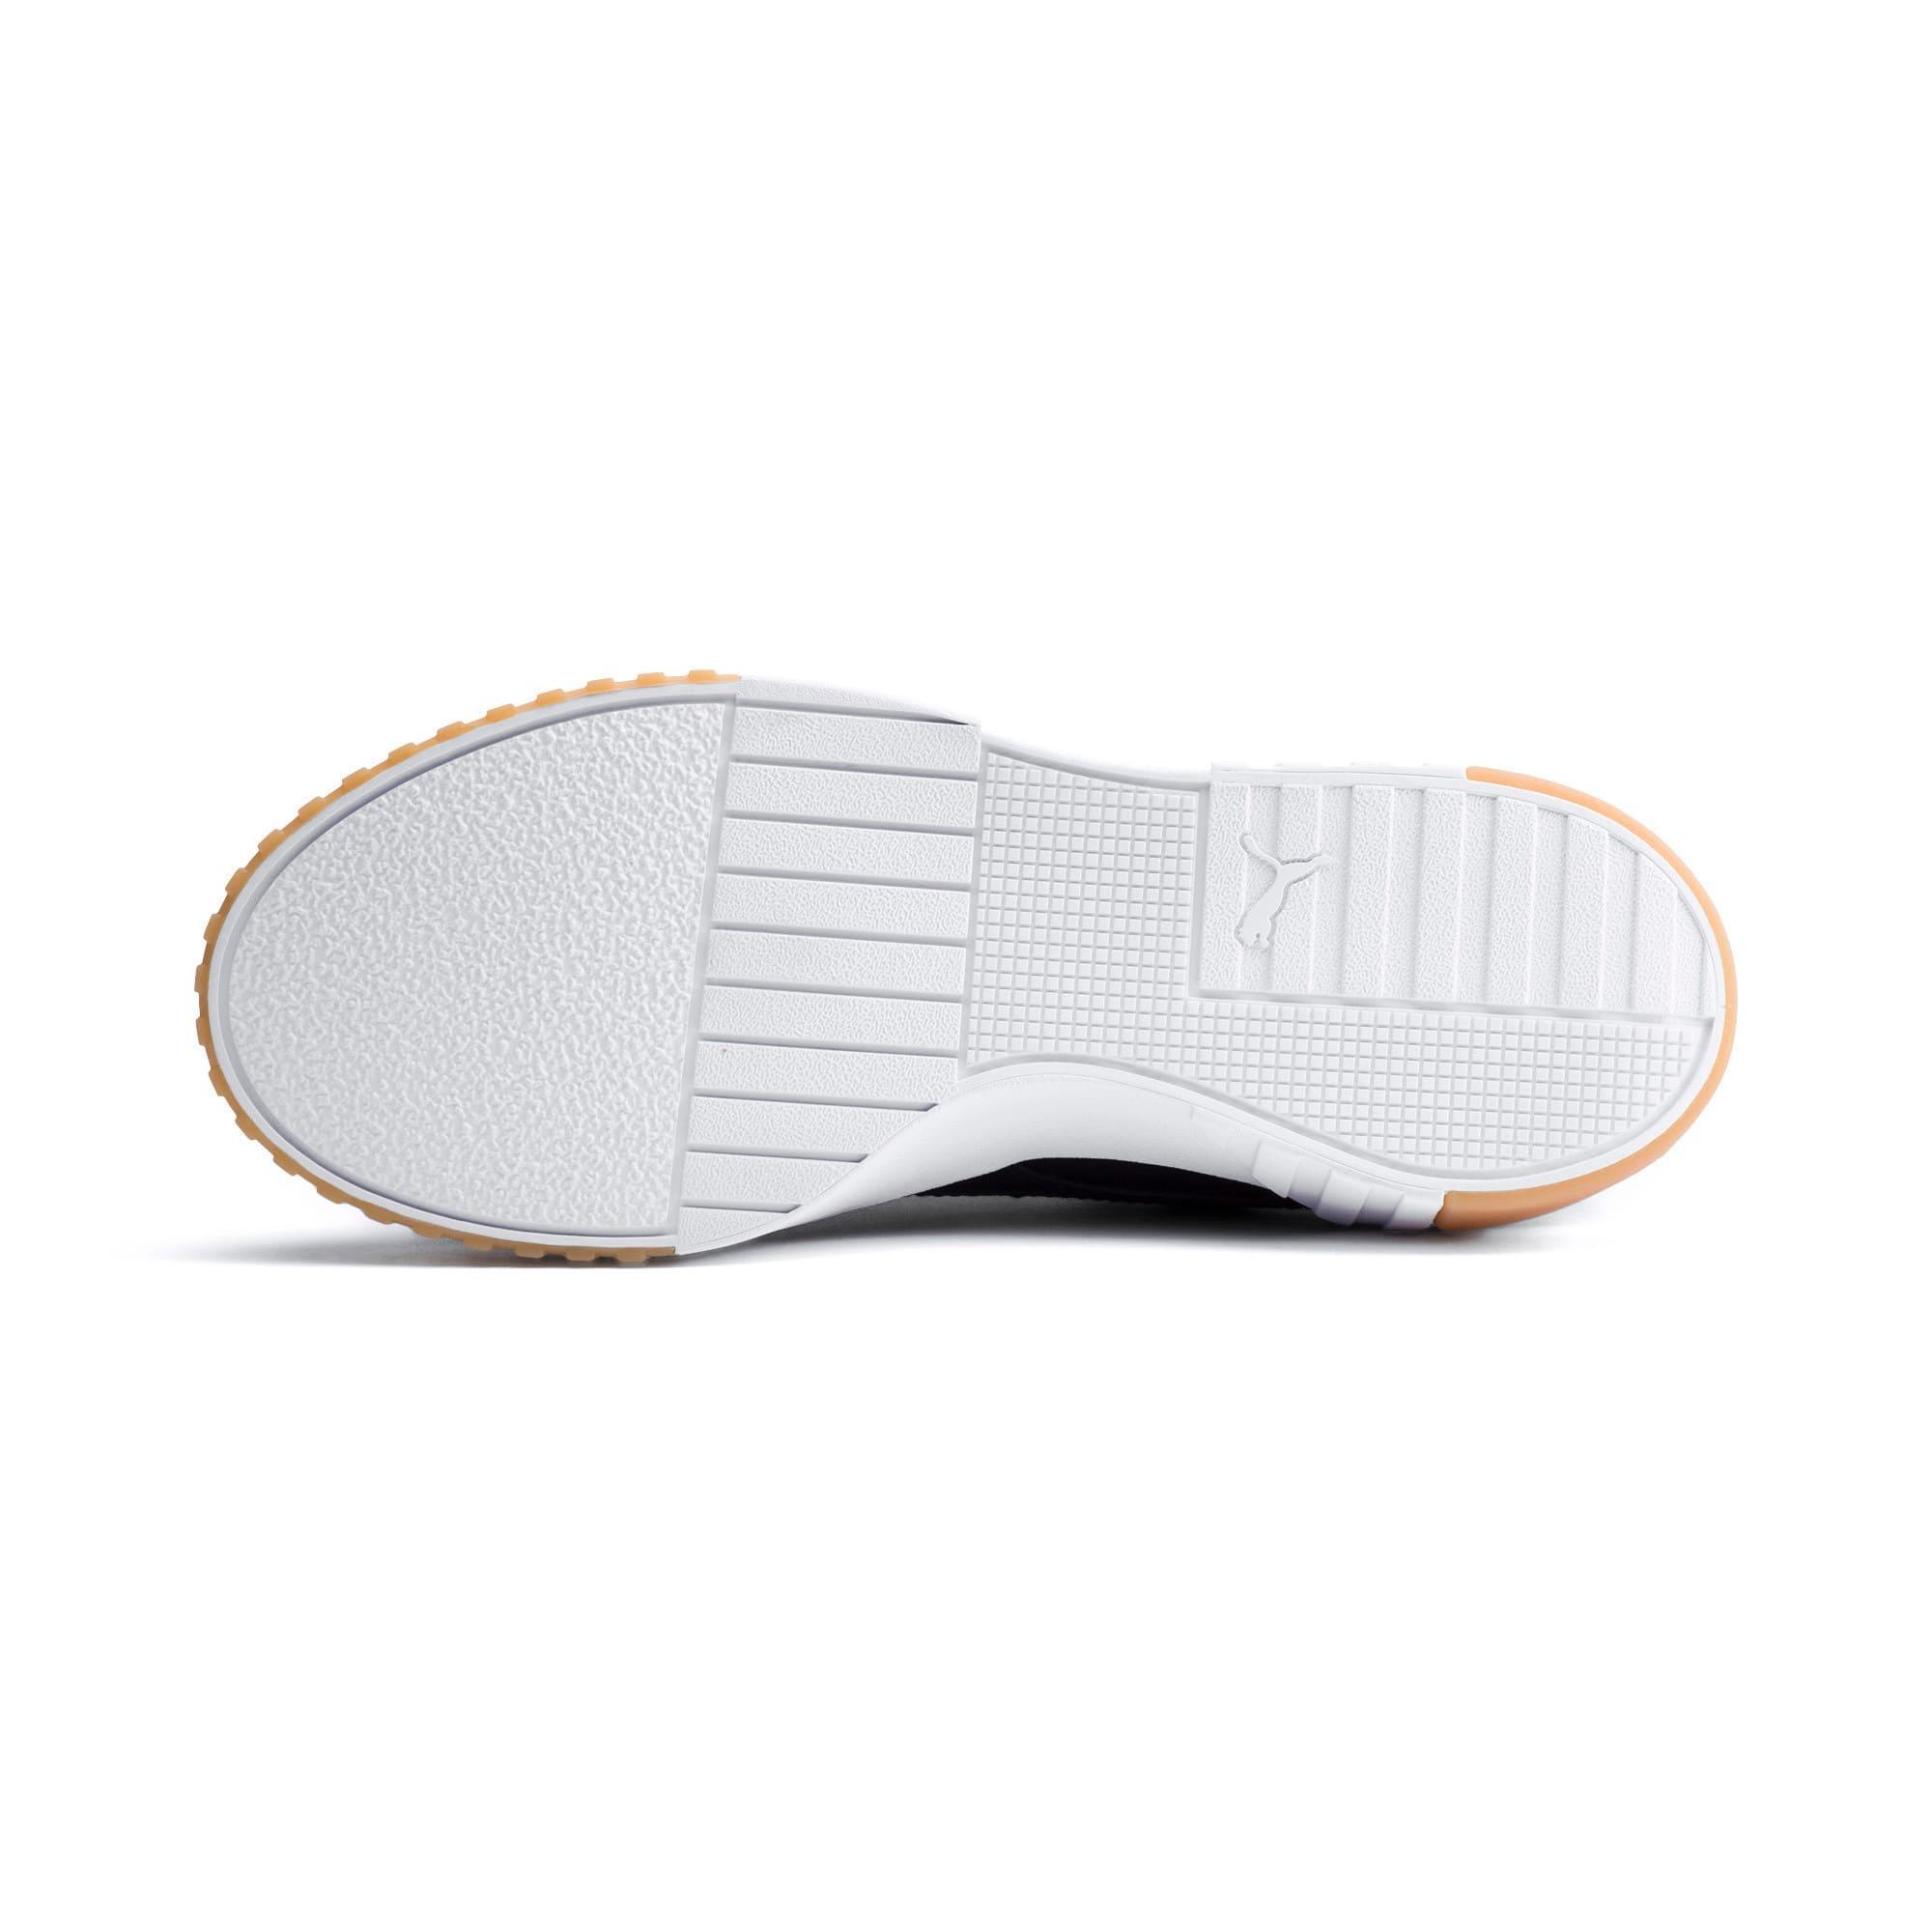 save off c56a1 2e8e5 Cali Exotic Women's Sneakers